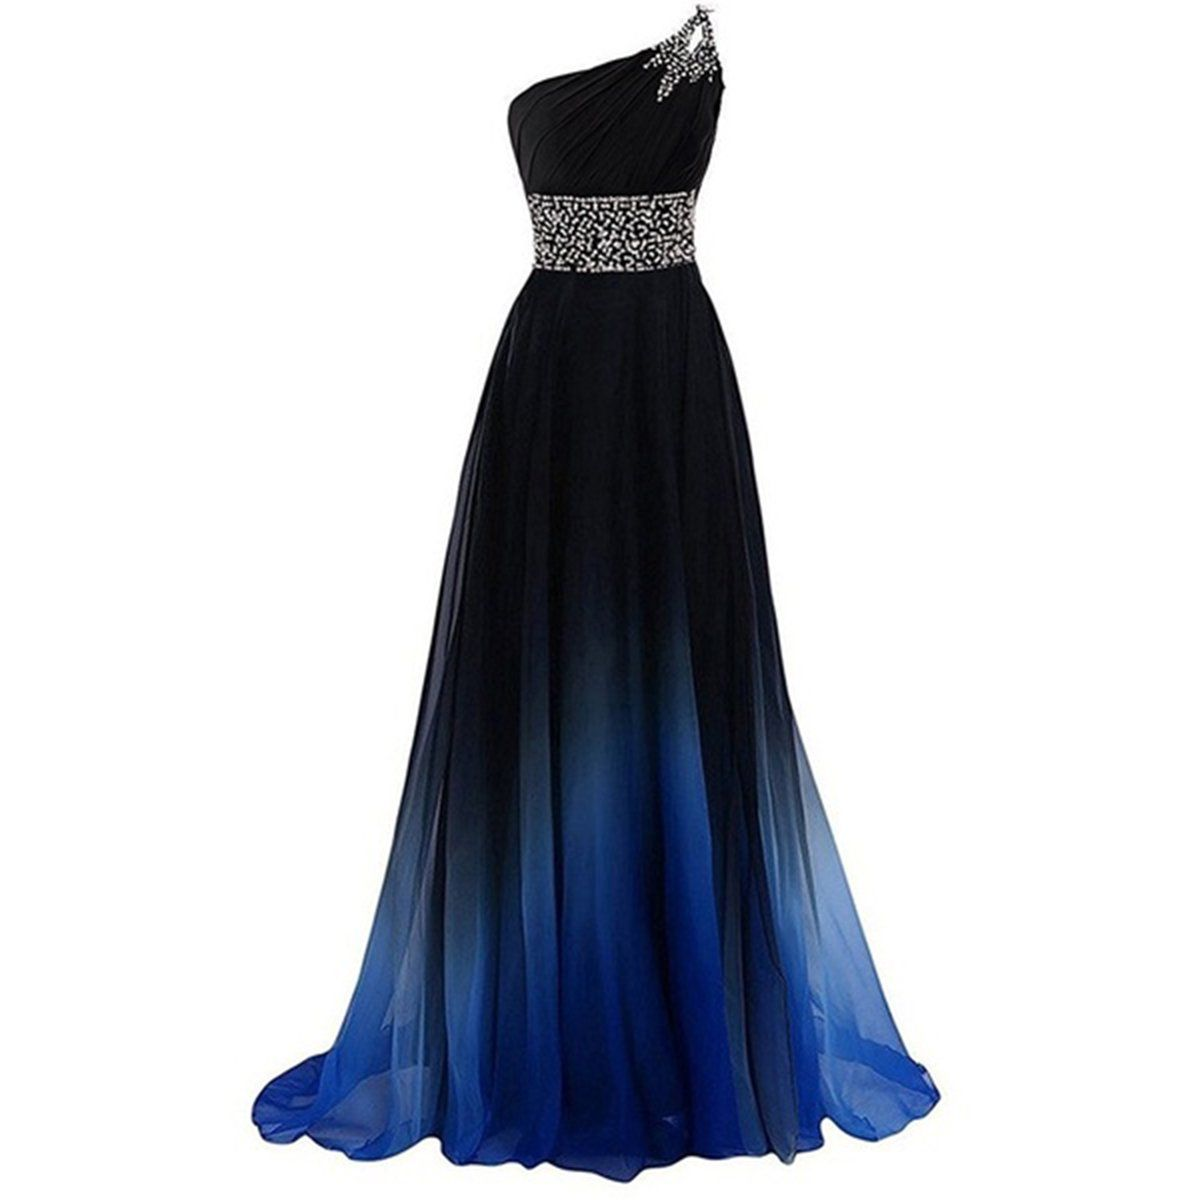 Lovaru Women One Shoulder Chiffon Evening Dresses Walmart Com Walmart Com In 2021 Chiffon Evening Dresses Prom Dresses Long Prom Dresses [ 1200 x 1200 Pixel ]